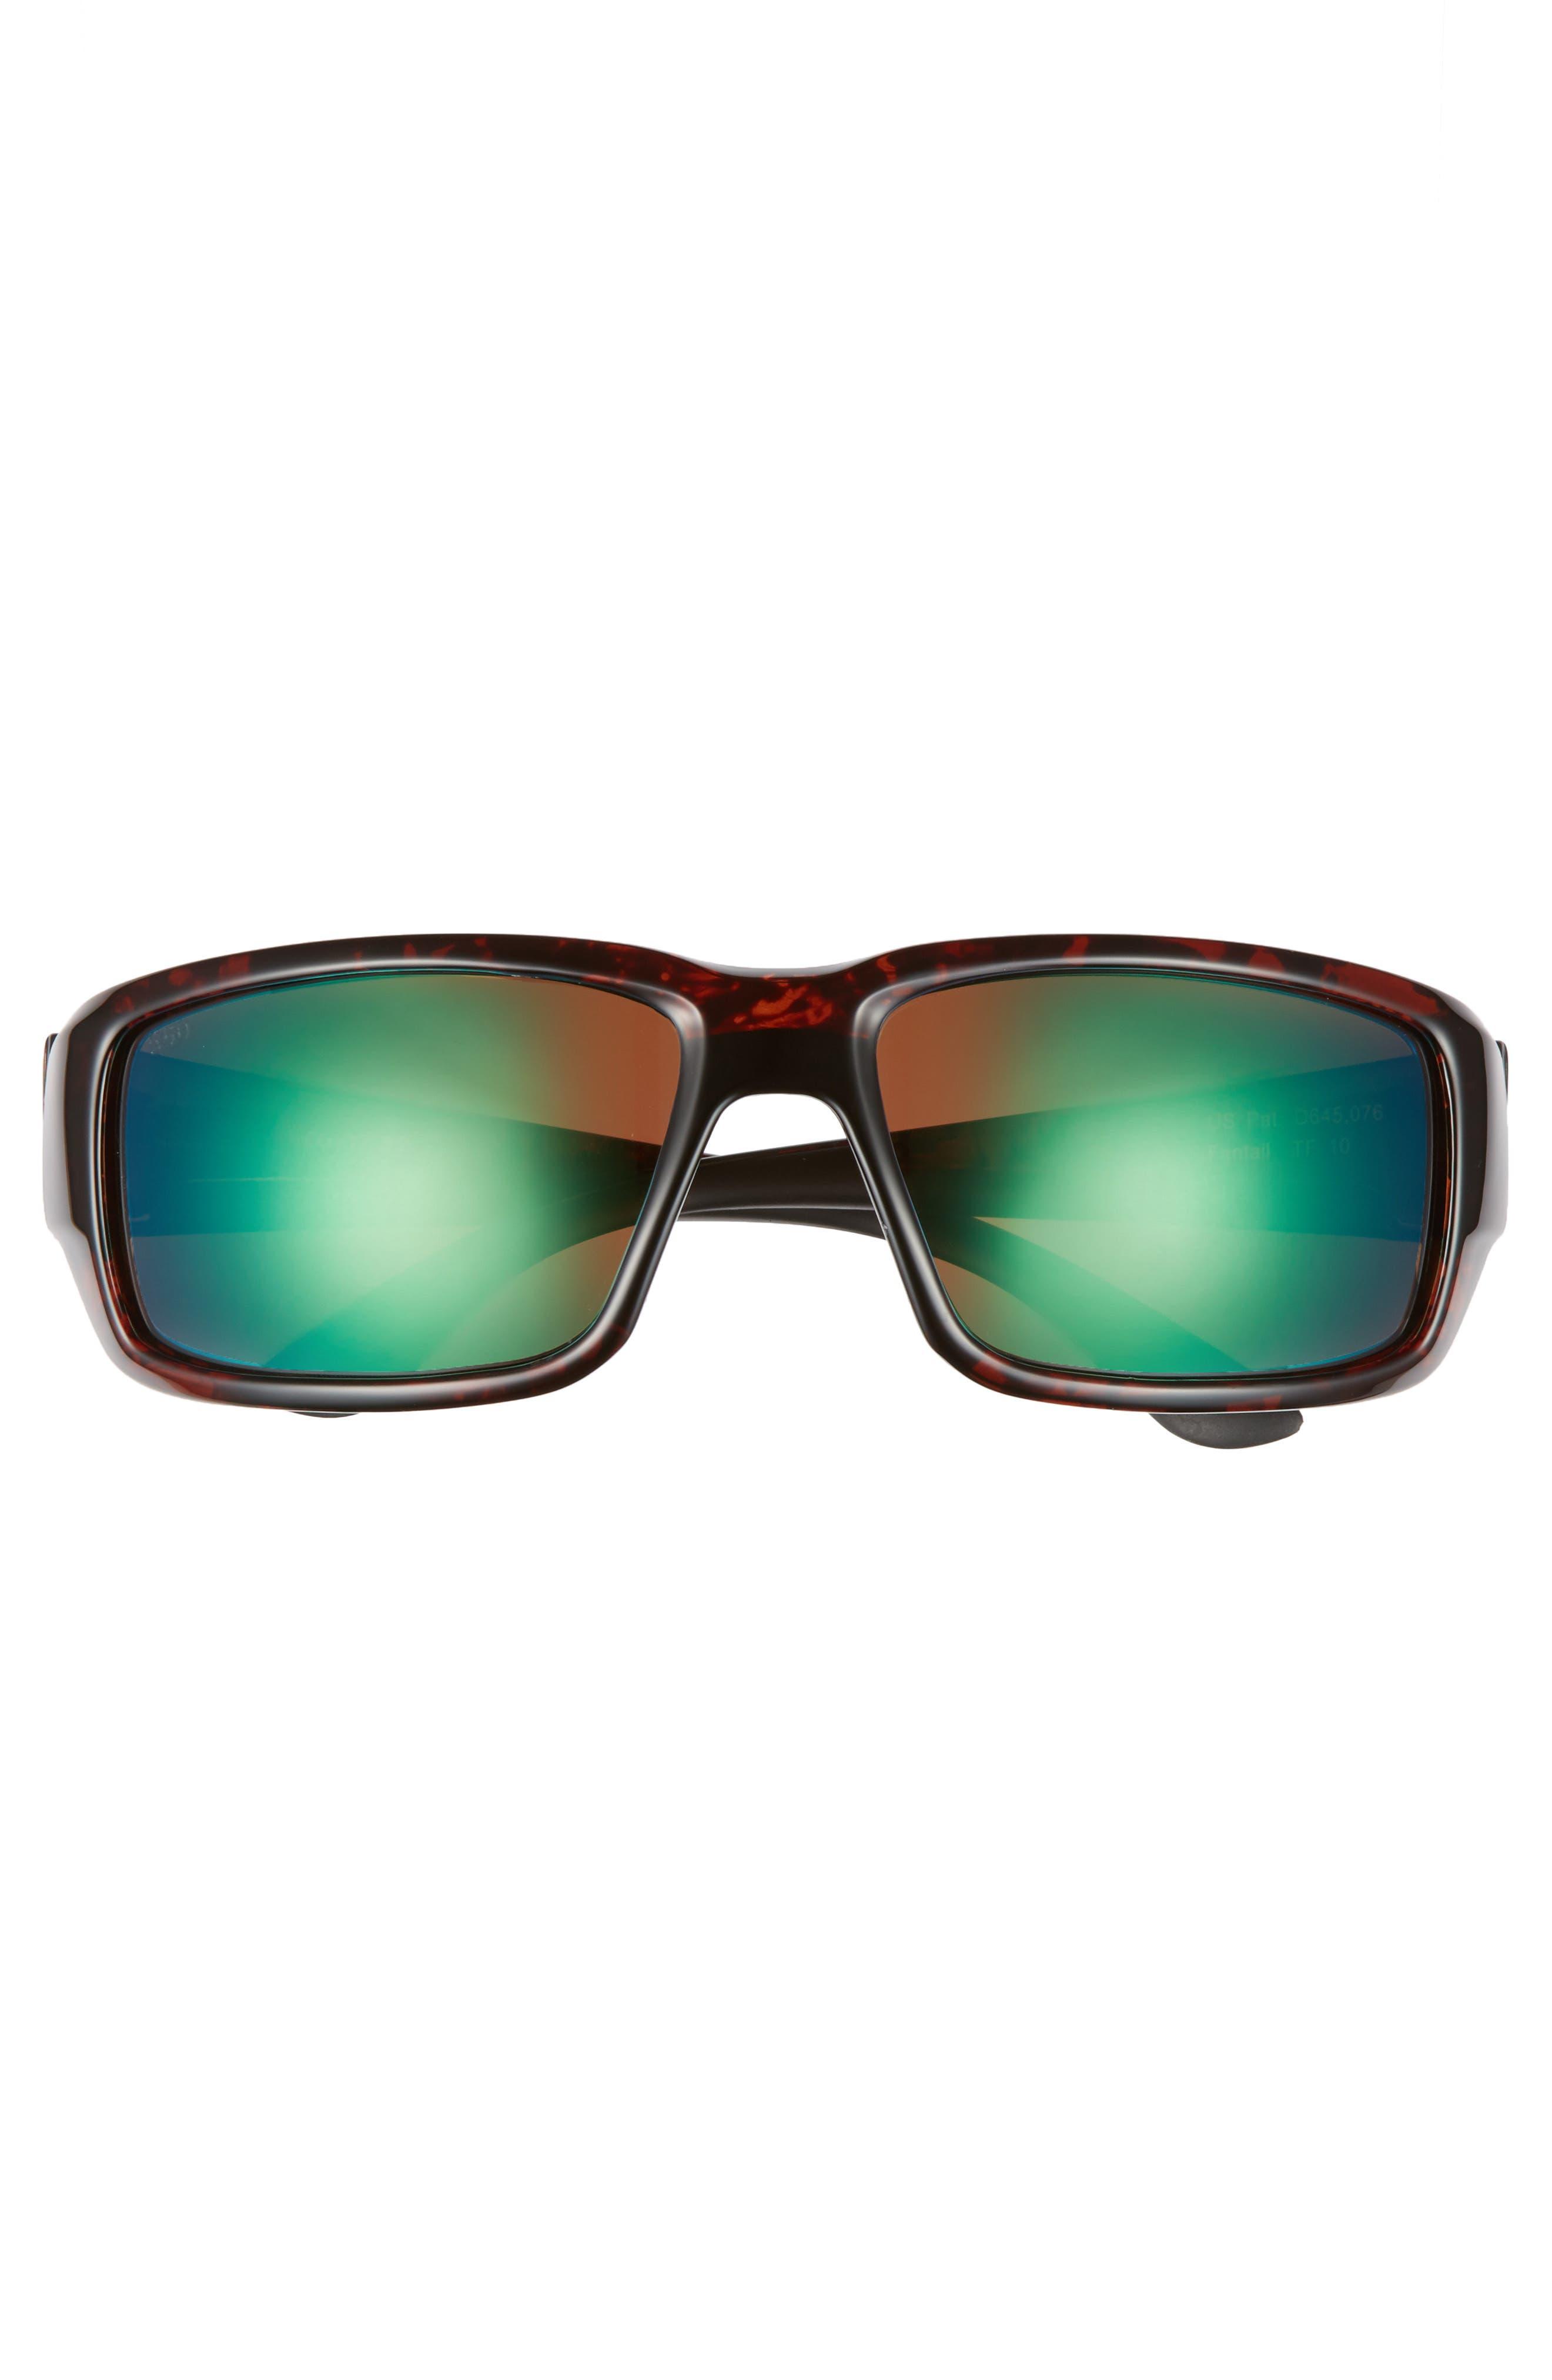 Fantail 60mm Polarized Sunglasses,                             Alternate thumbnail 2, color,                             Tortoise/ Green Mirror